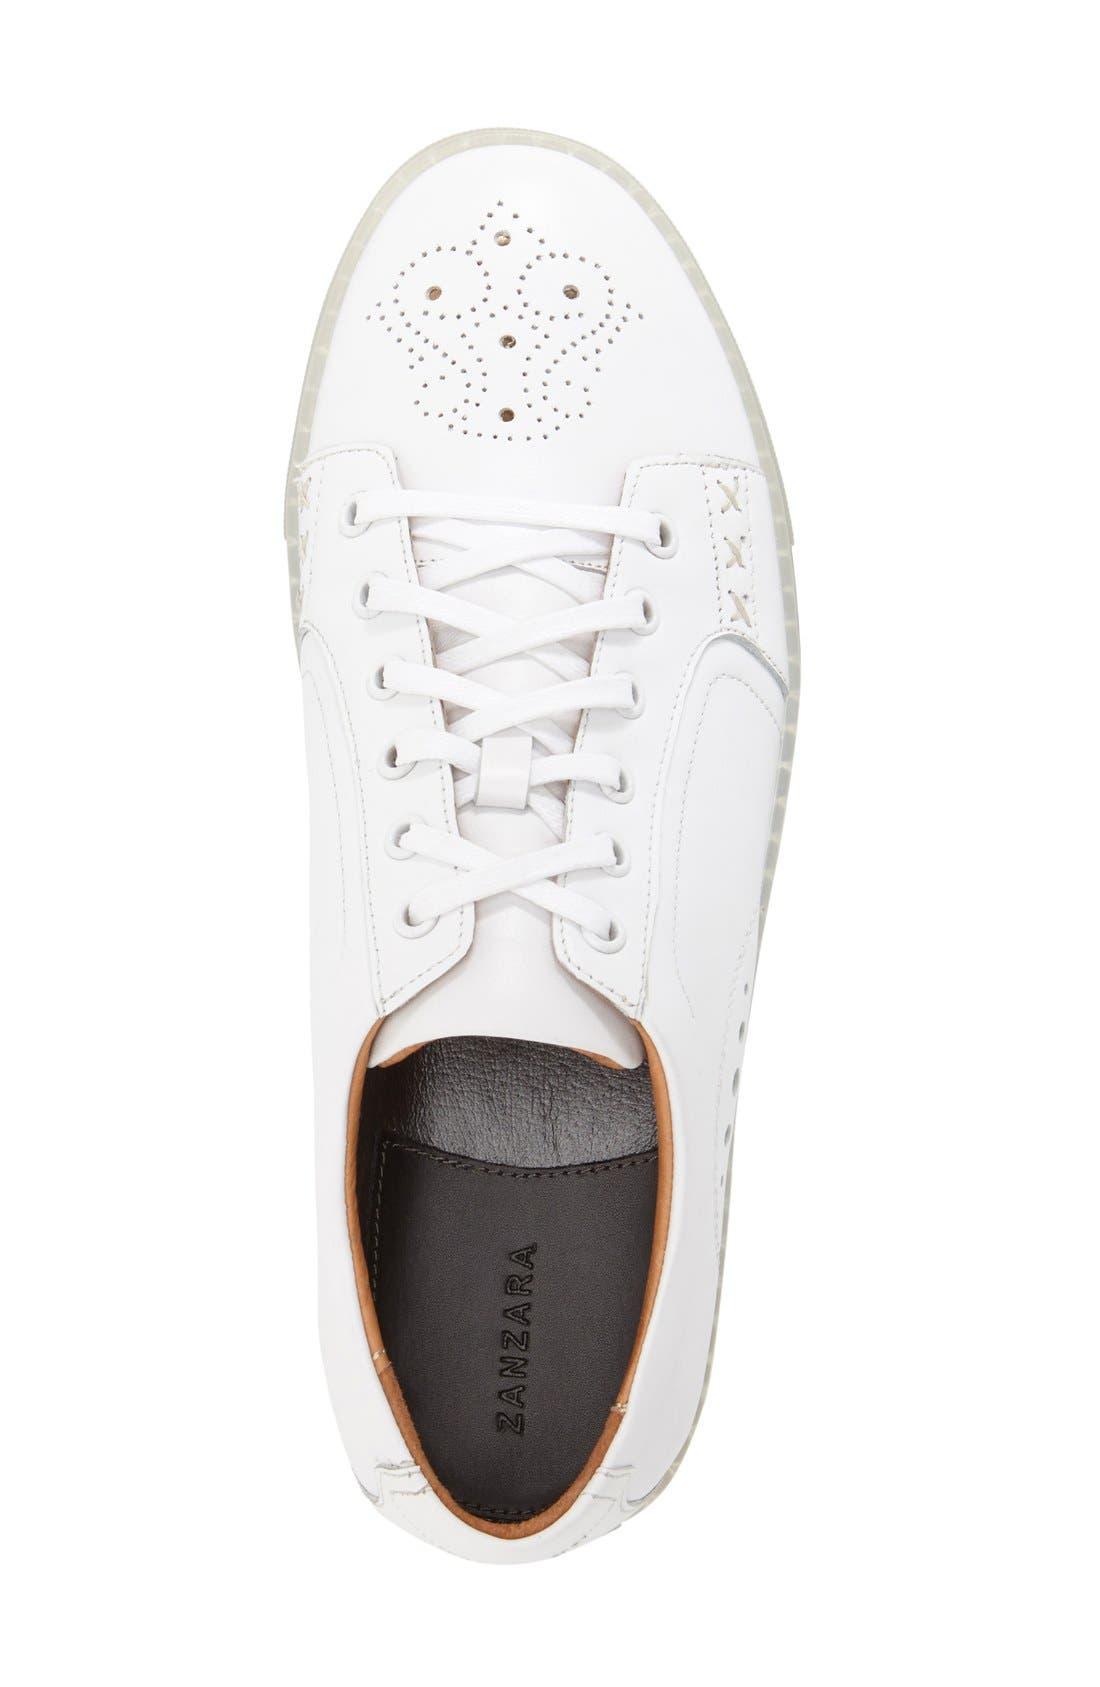 Alternate Image 3  - Zanzara 'Drum' Lace-Up Sneaker (Men)